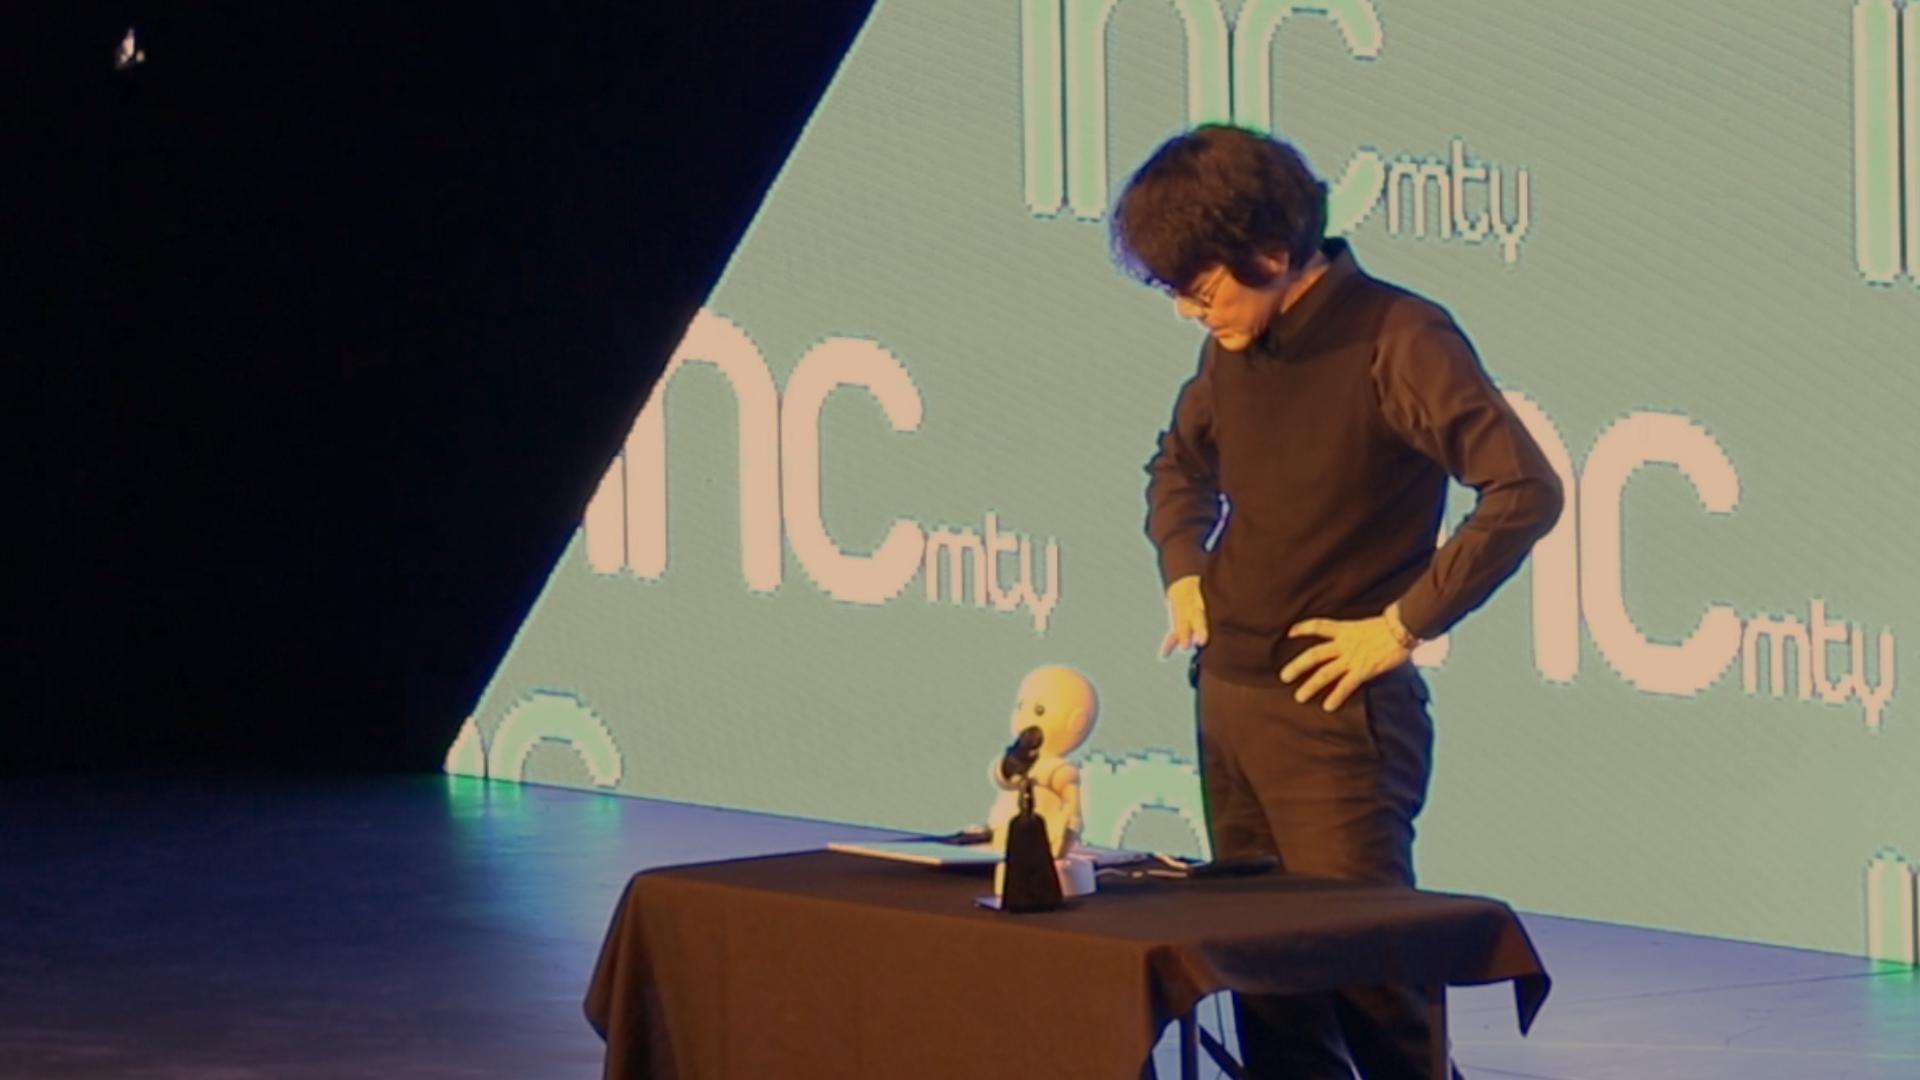 Creó un robot idéntico a él con un propósito: descubrir si albergaría su